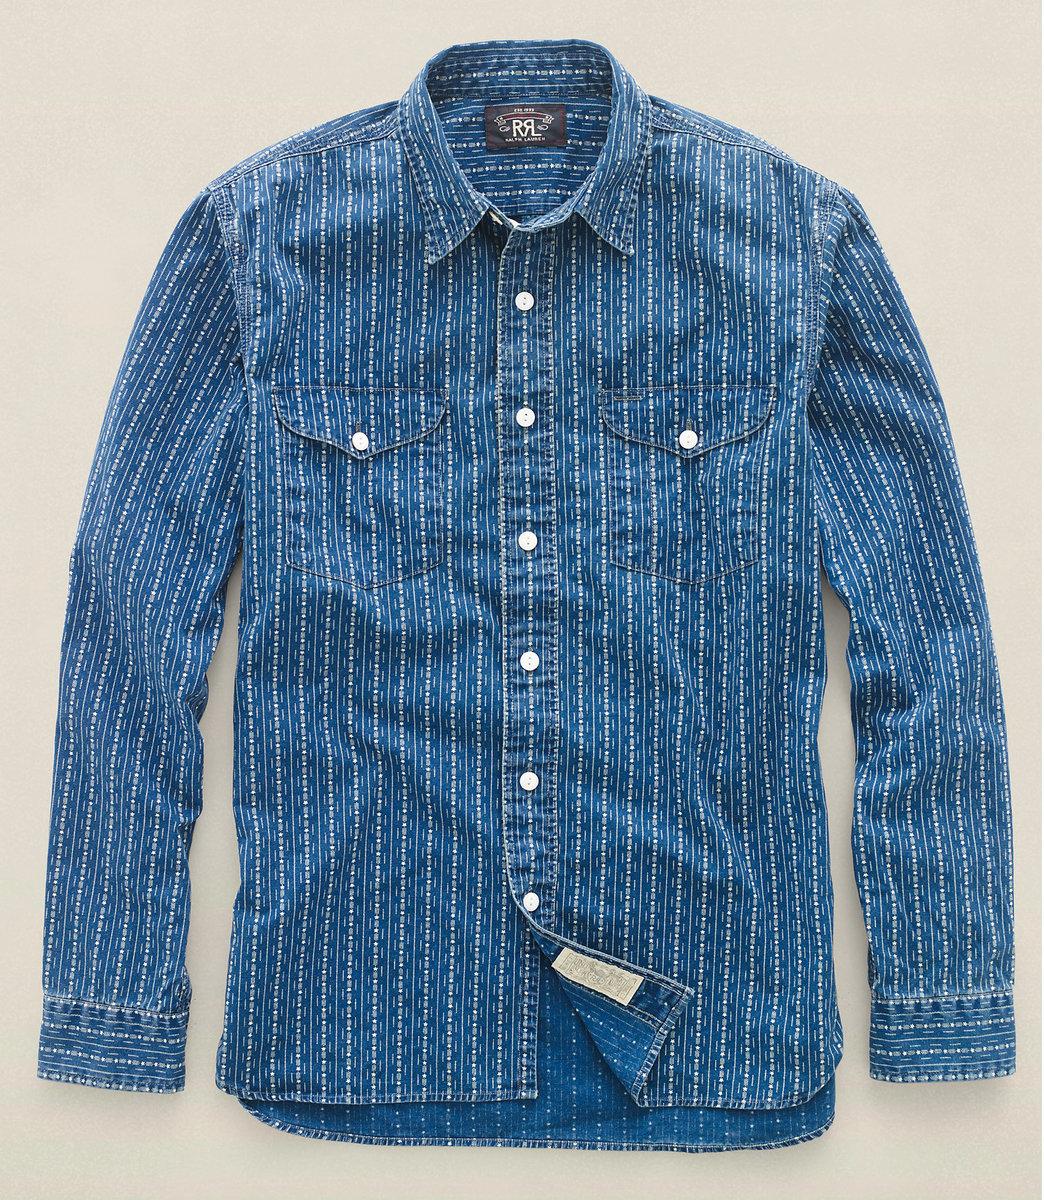 rrl-indigo-shooting-star-indigo-striped-cotton-shirt.jpg